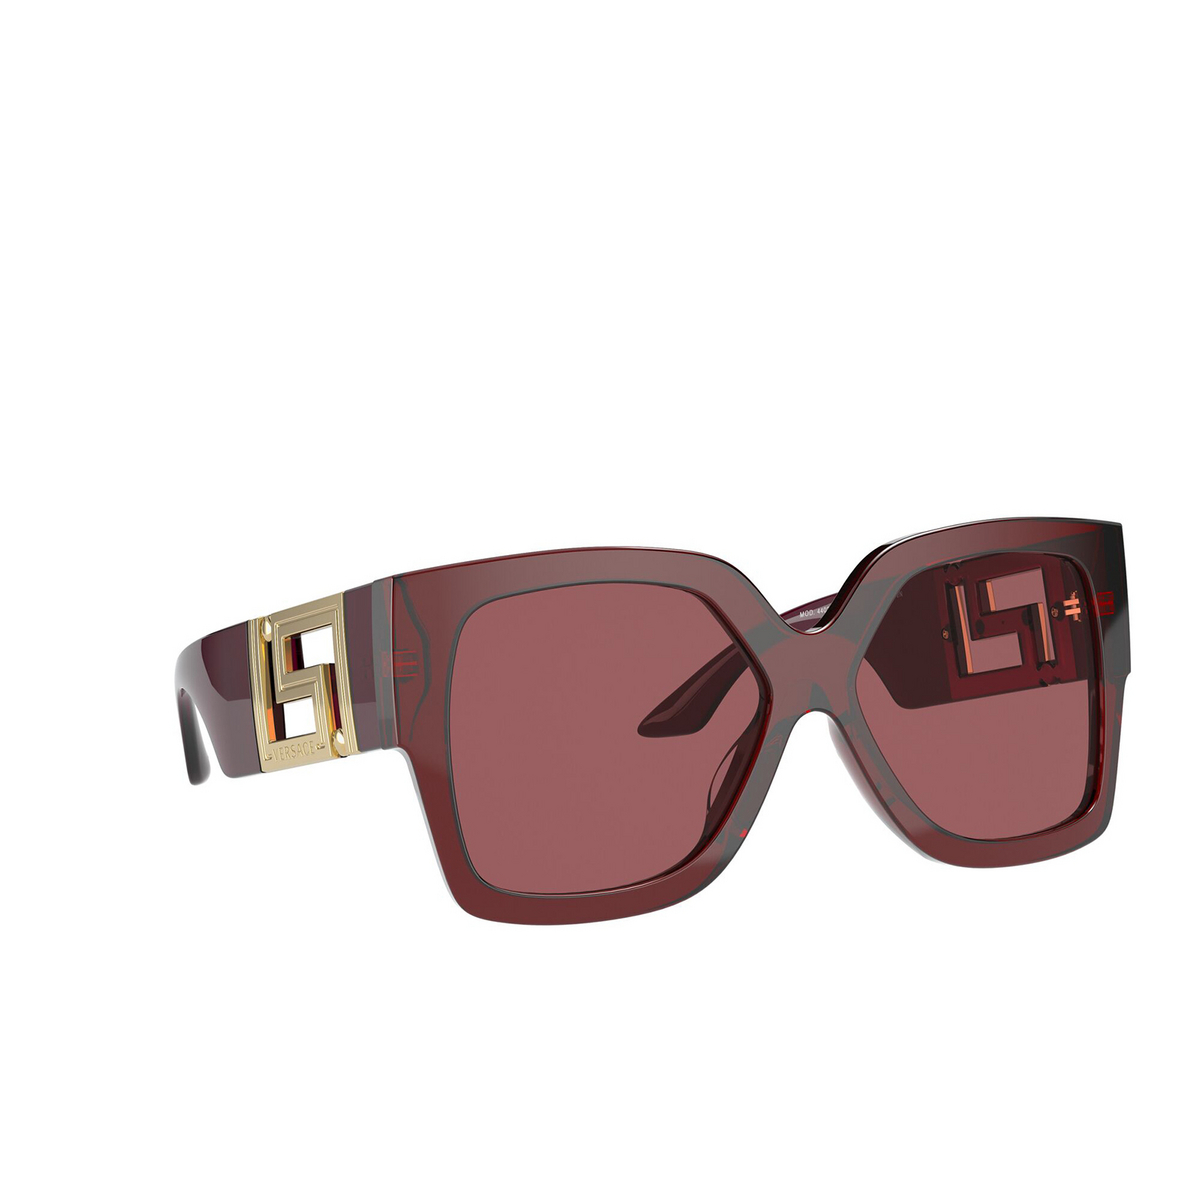 Versace® Square Sunglasses: VE4402 color Transparent Red 388/69 - three-quarters view.